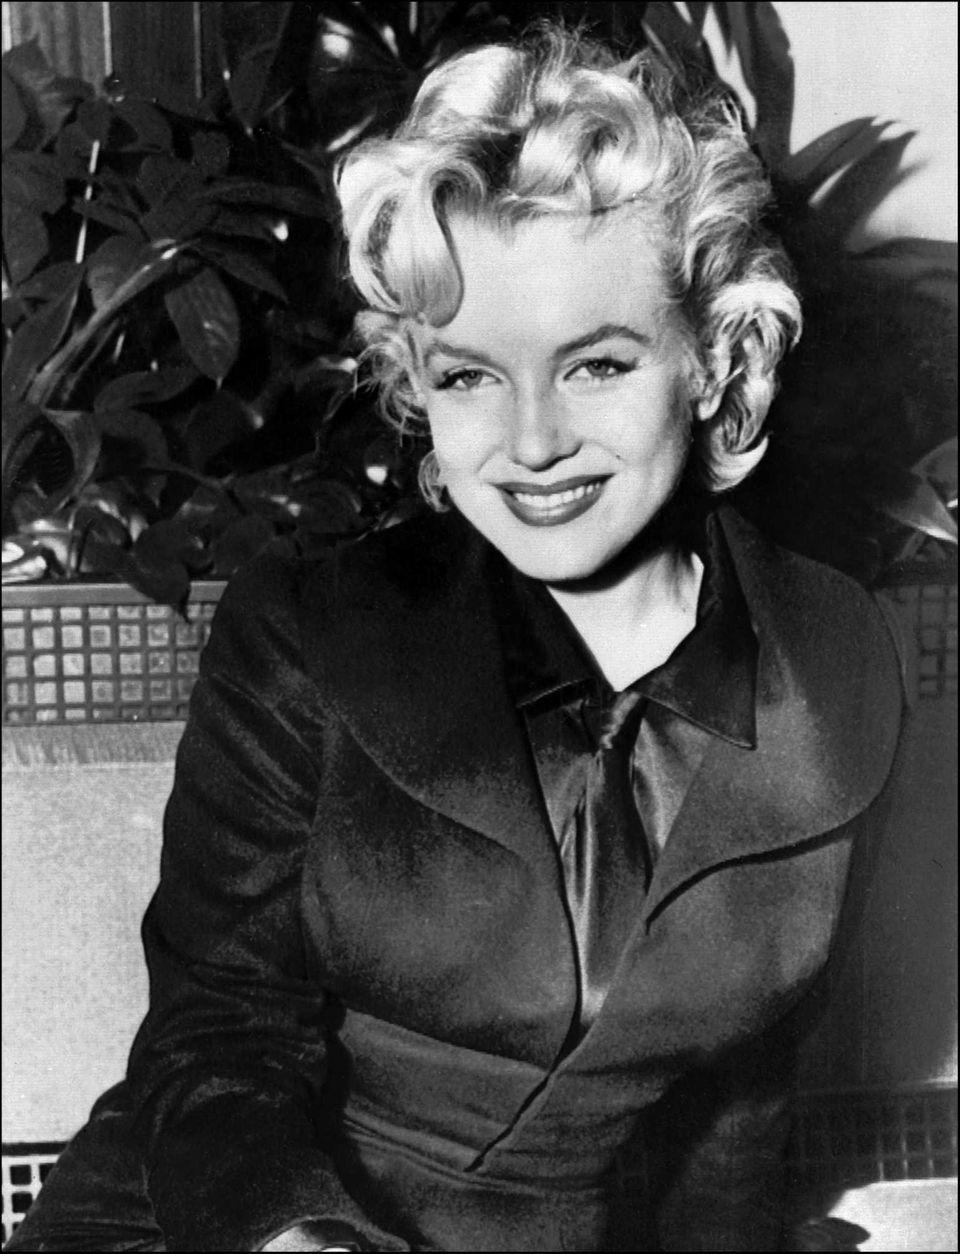 Marilyn Monroe was born Norma Jeane Mortensen to